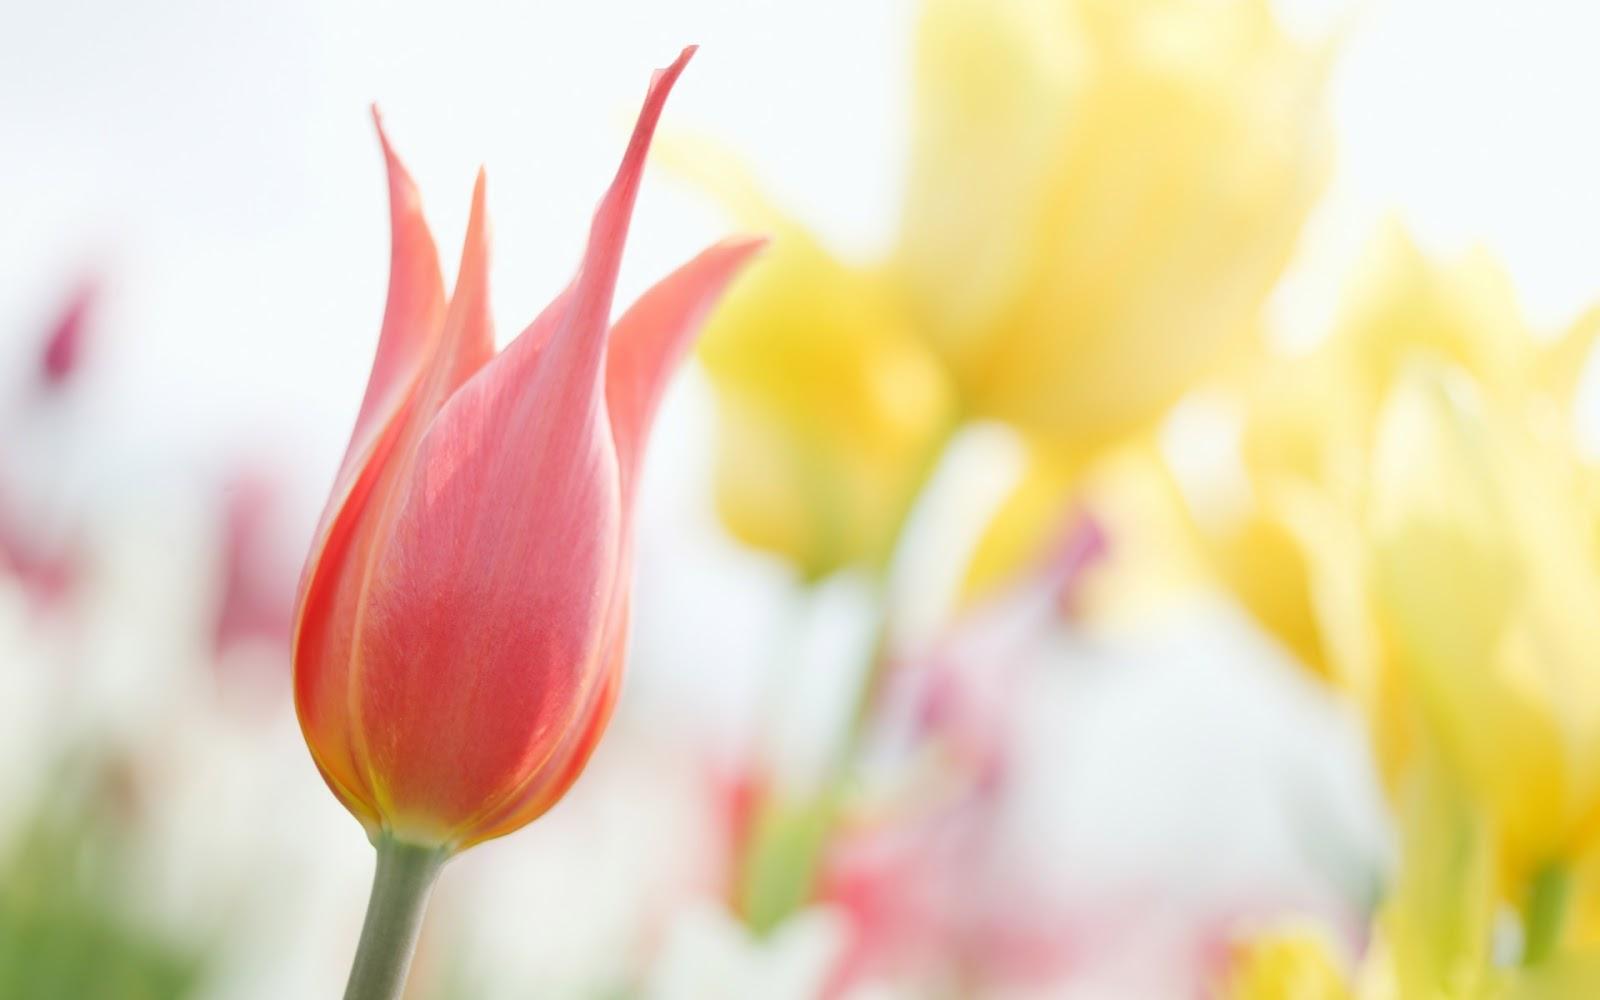 Rose Flower Wallpaper Hd Free Download Hd Wallpapers Tulip Hd Wallpapers